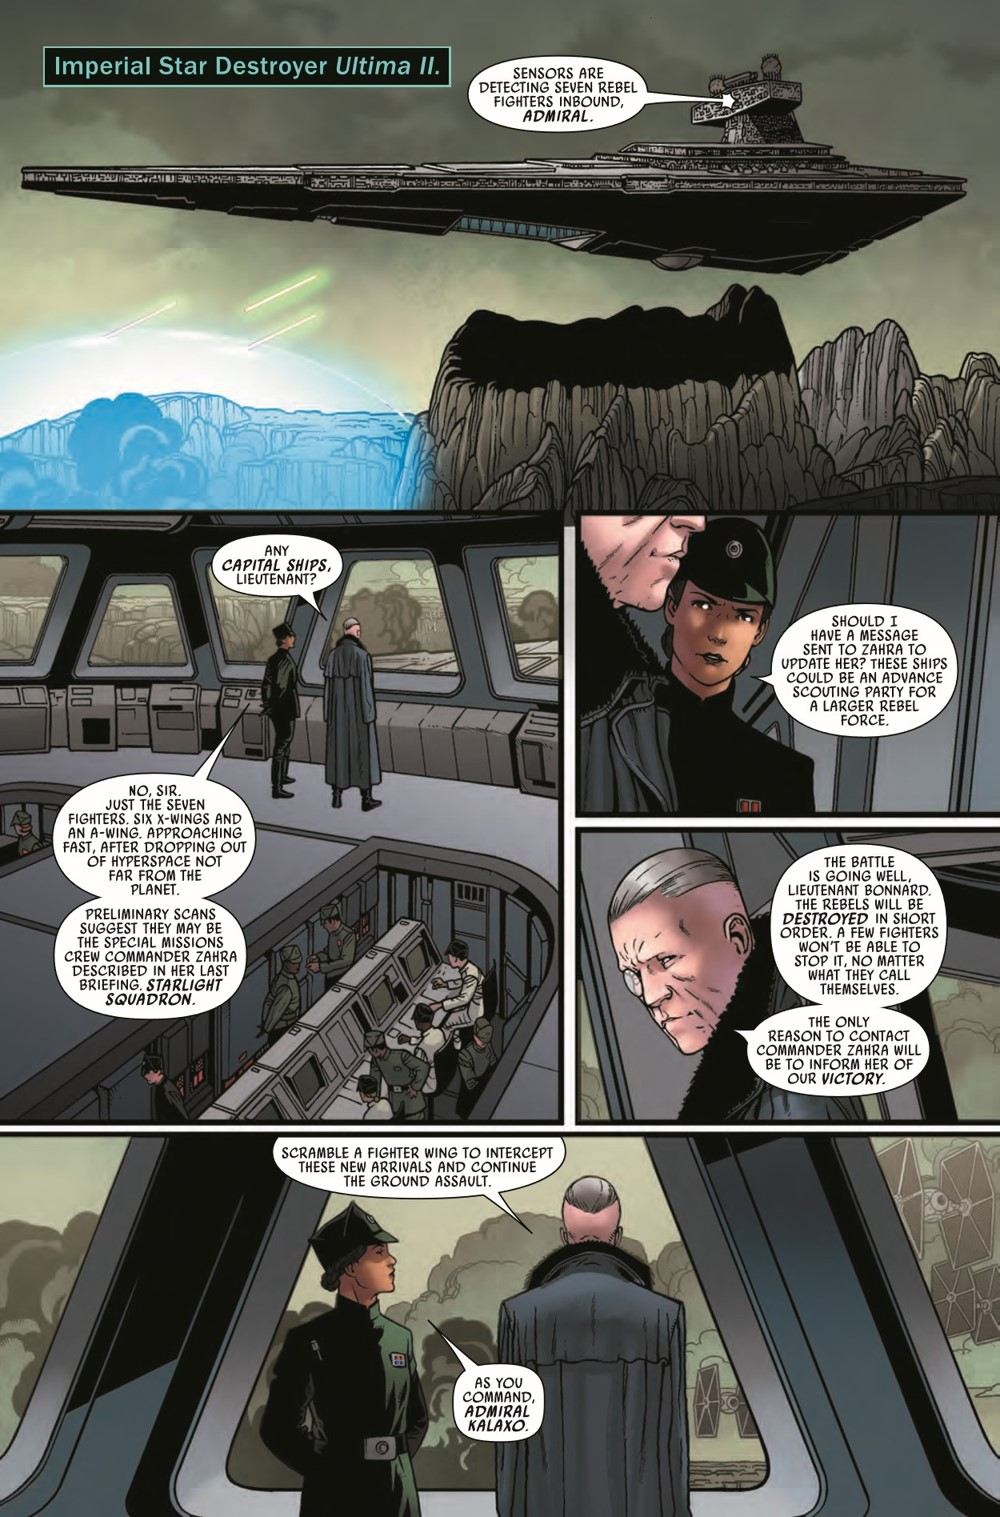 STWARS2020015_Preview-5-1 ComicList Previews: STAR WARS #15